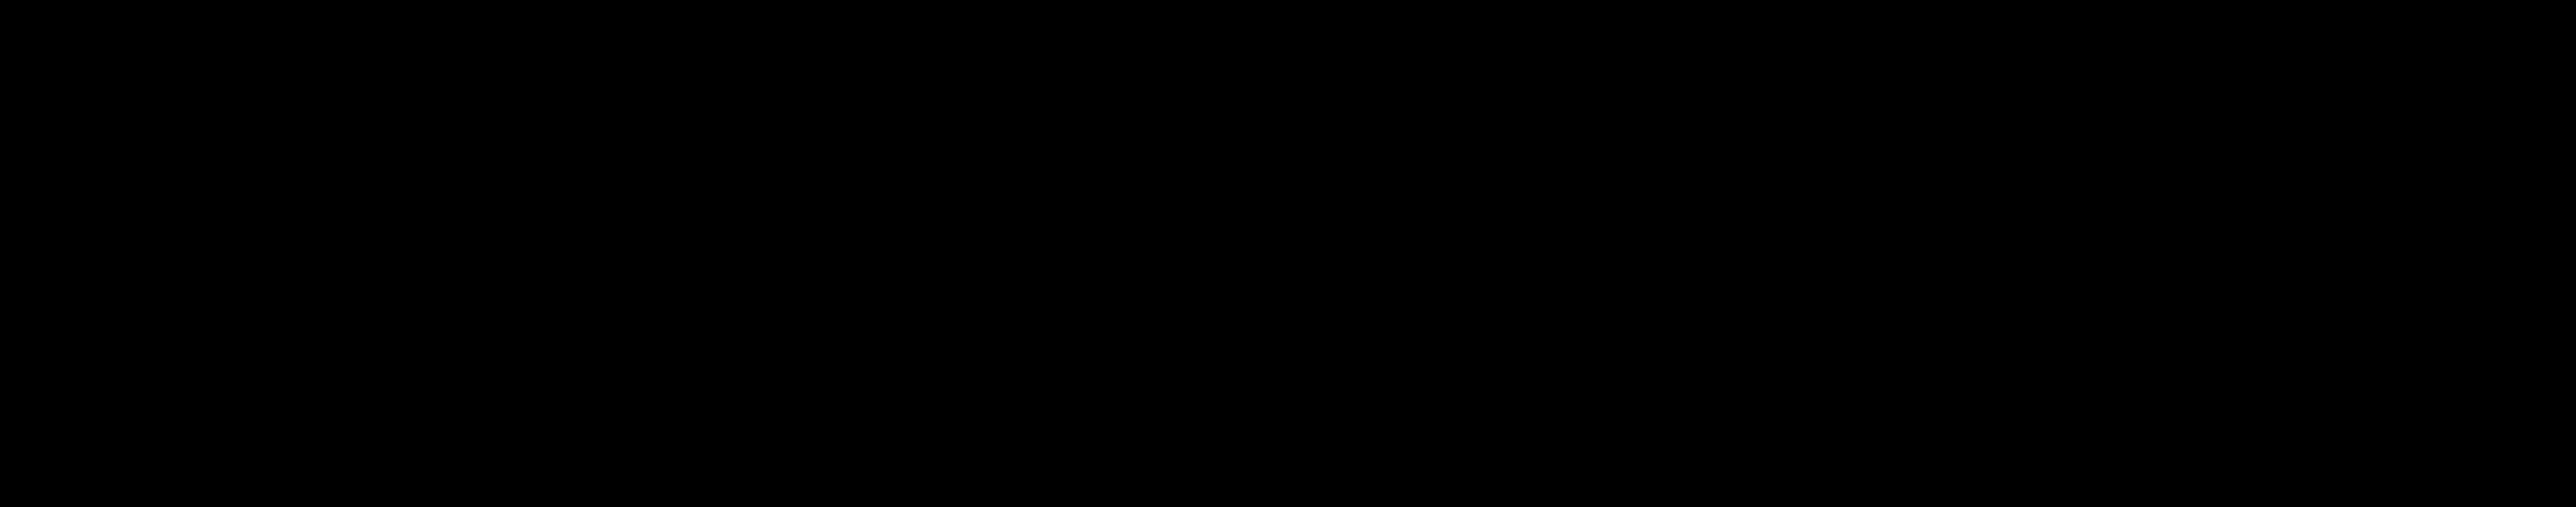 logo binesmart